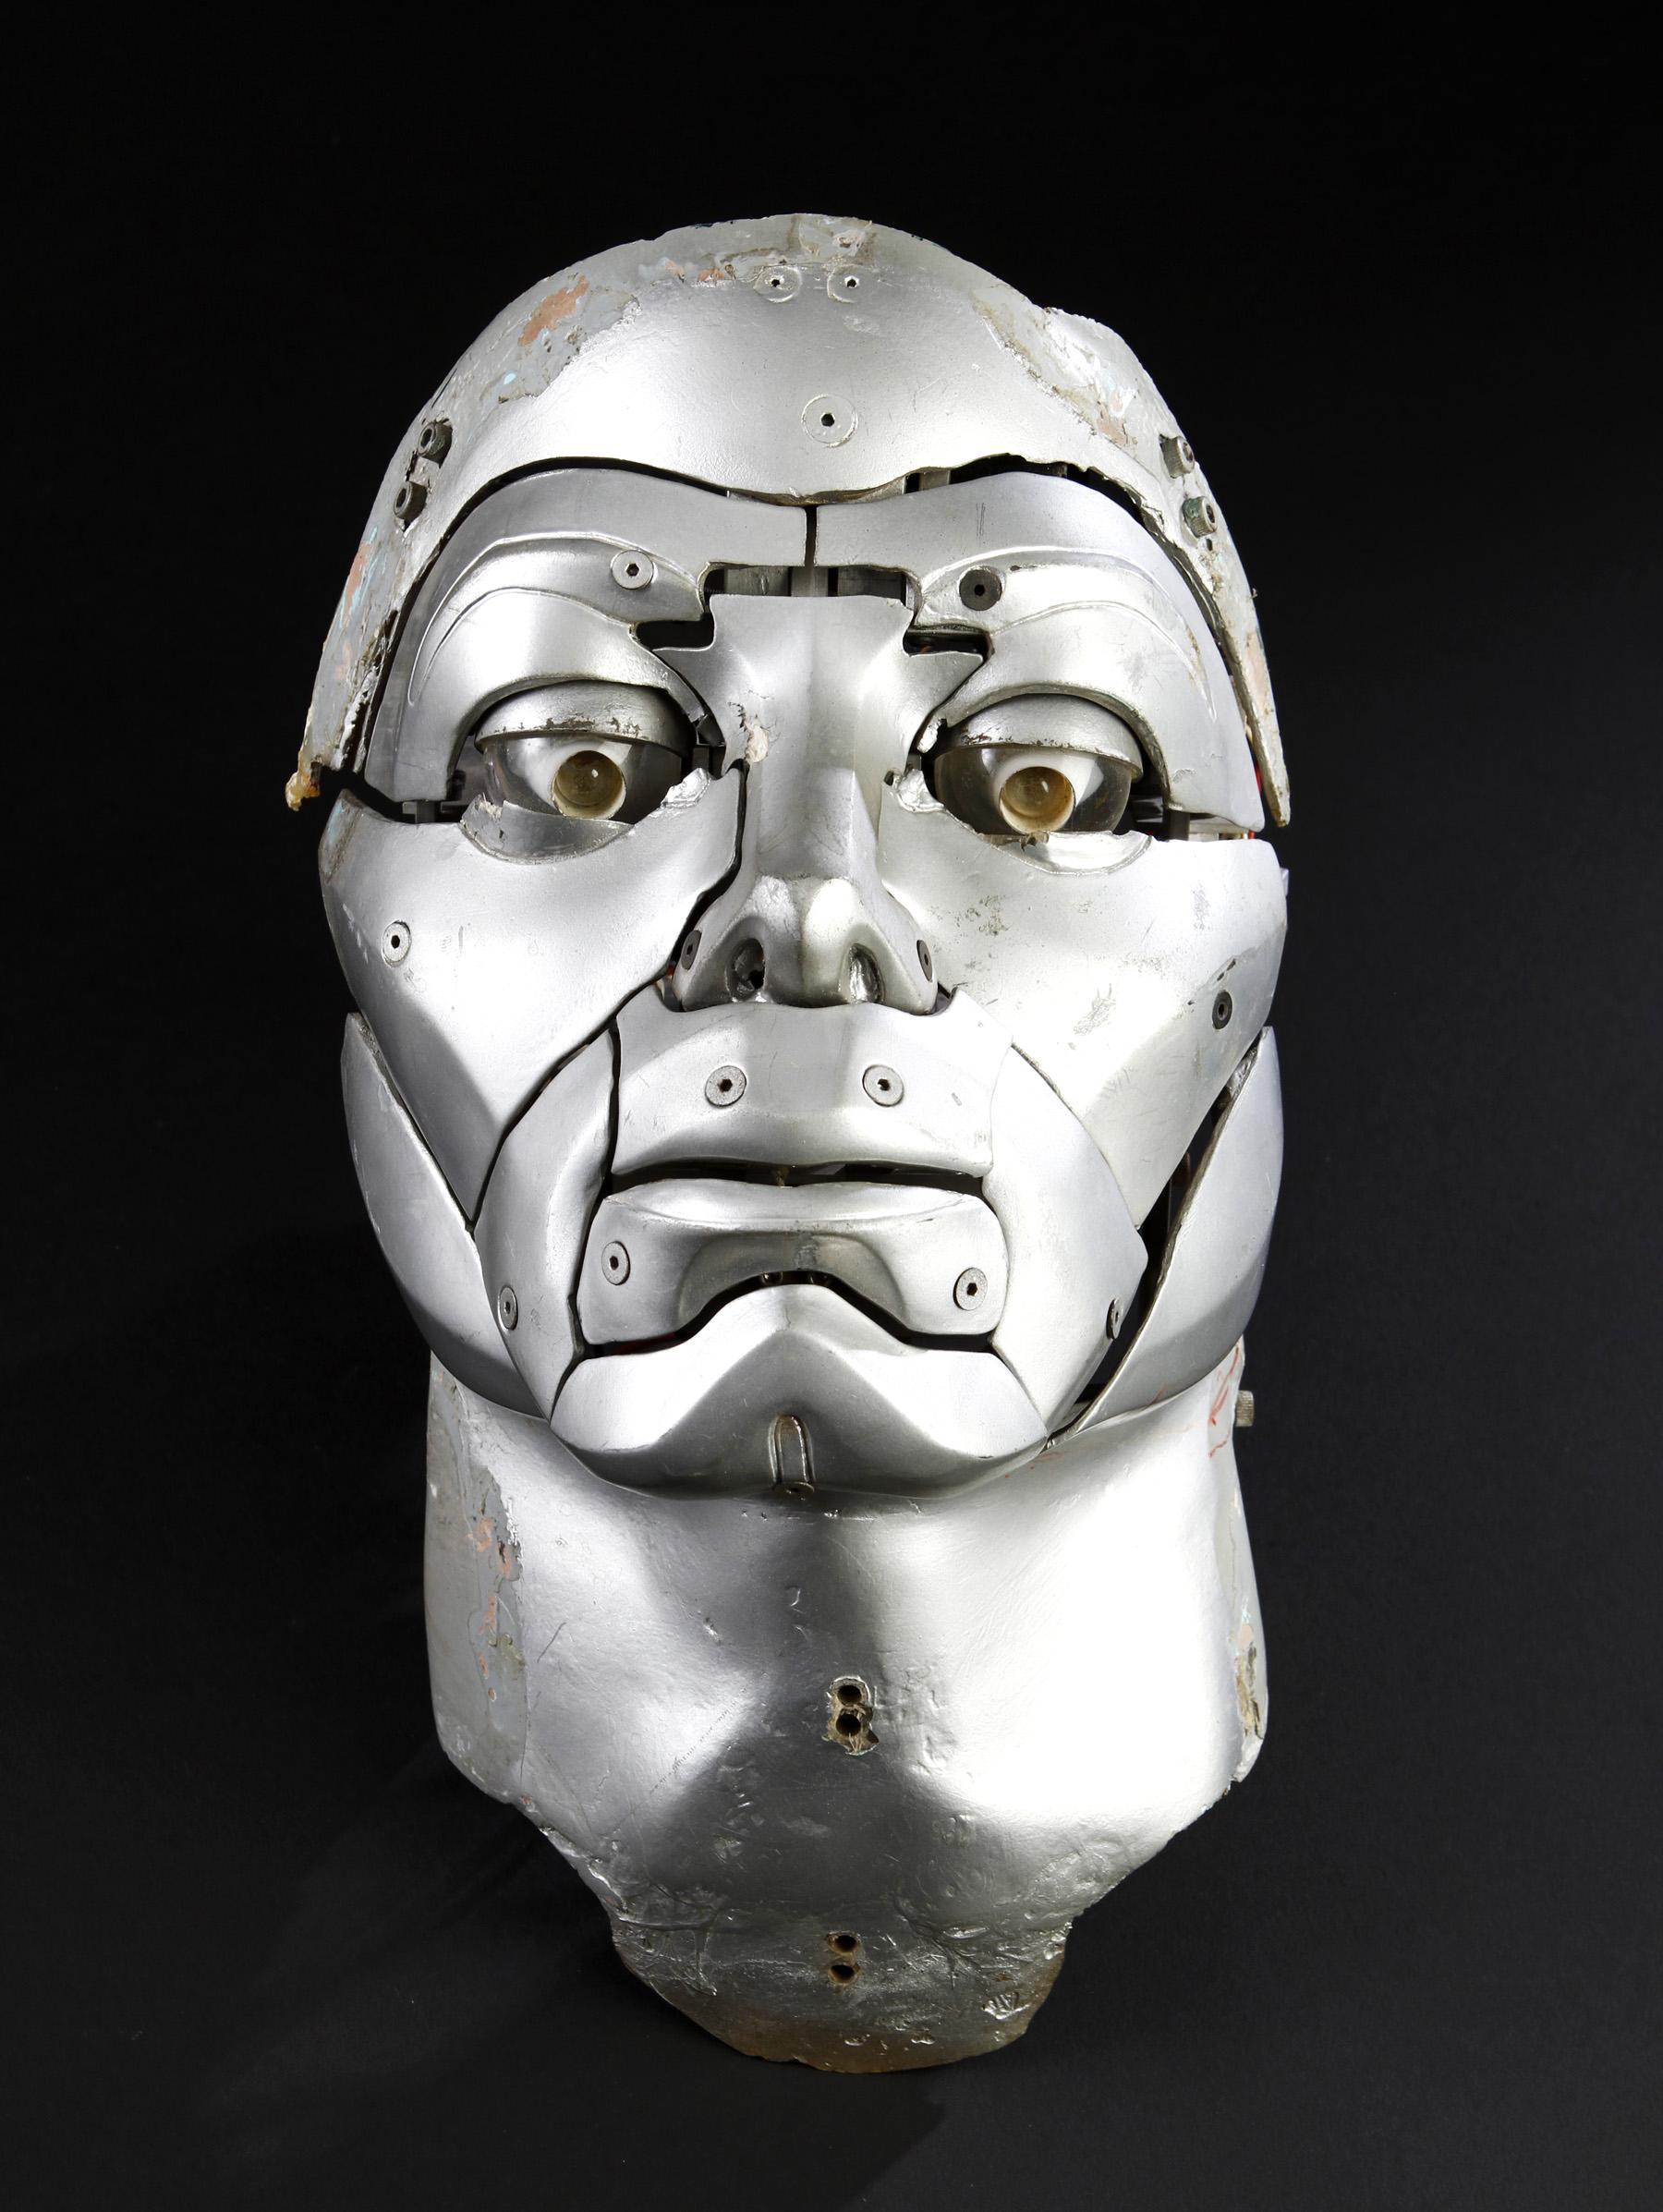 AuctionLot72-Prototype Michael Jackson Robotic Transformation Face-Moonwalker.jpeg